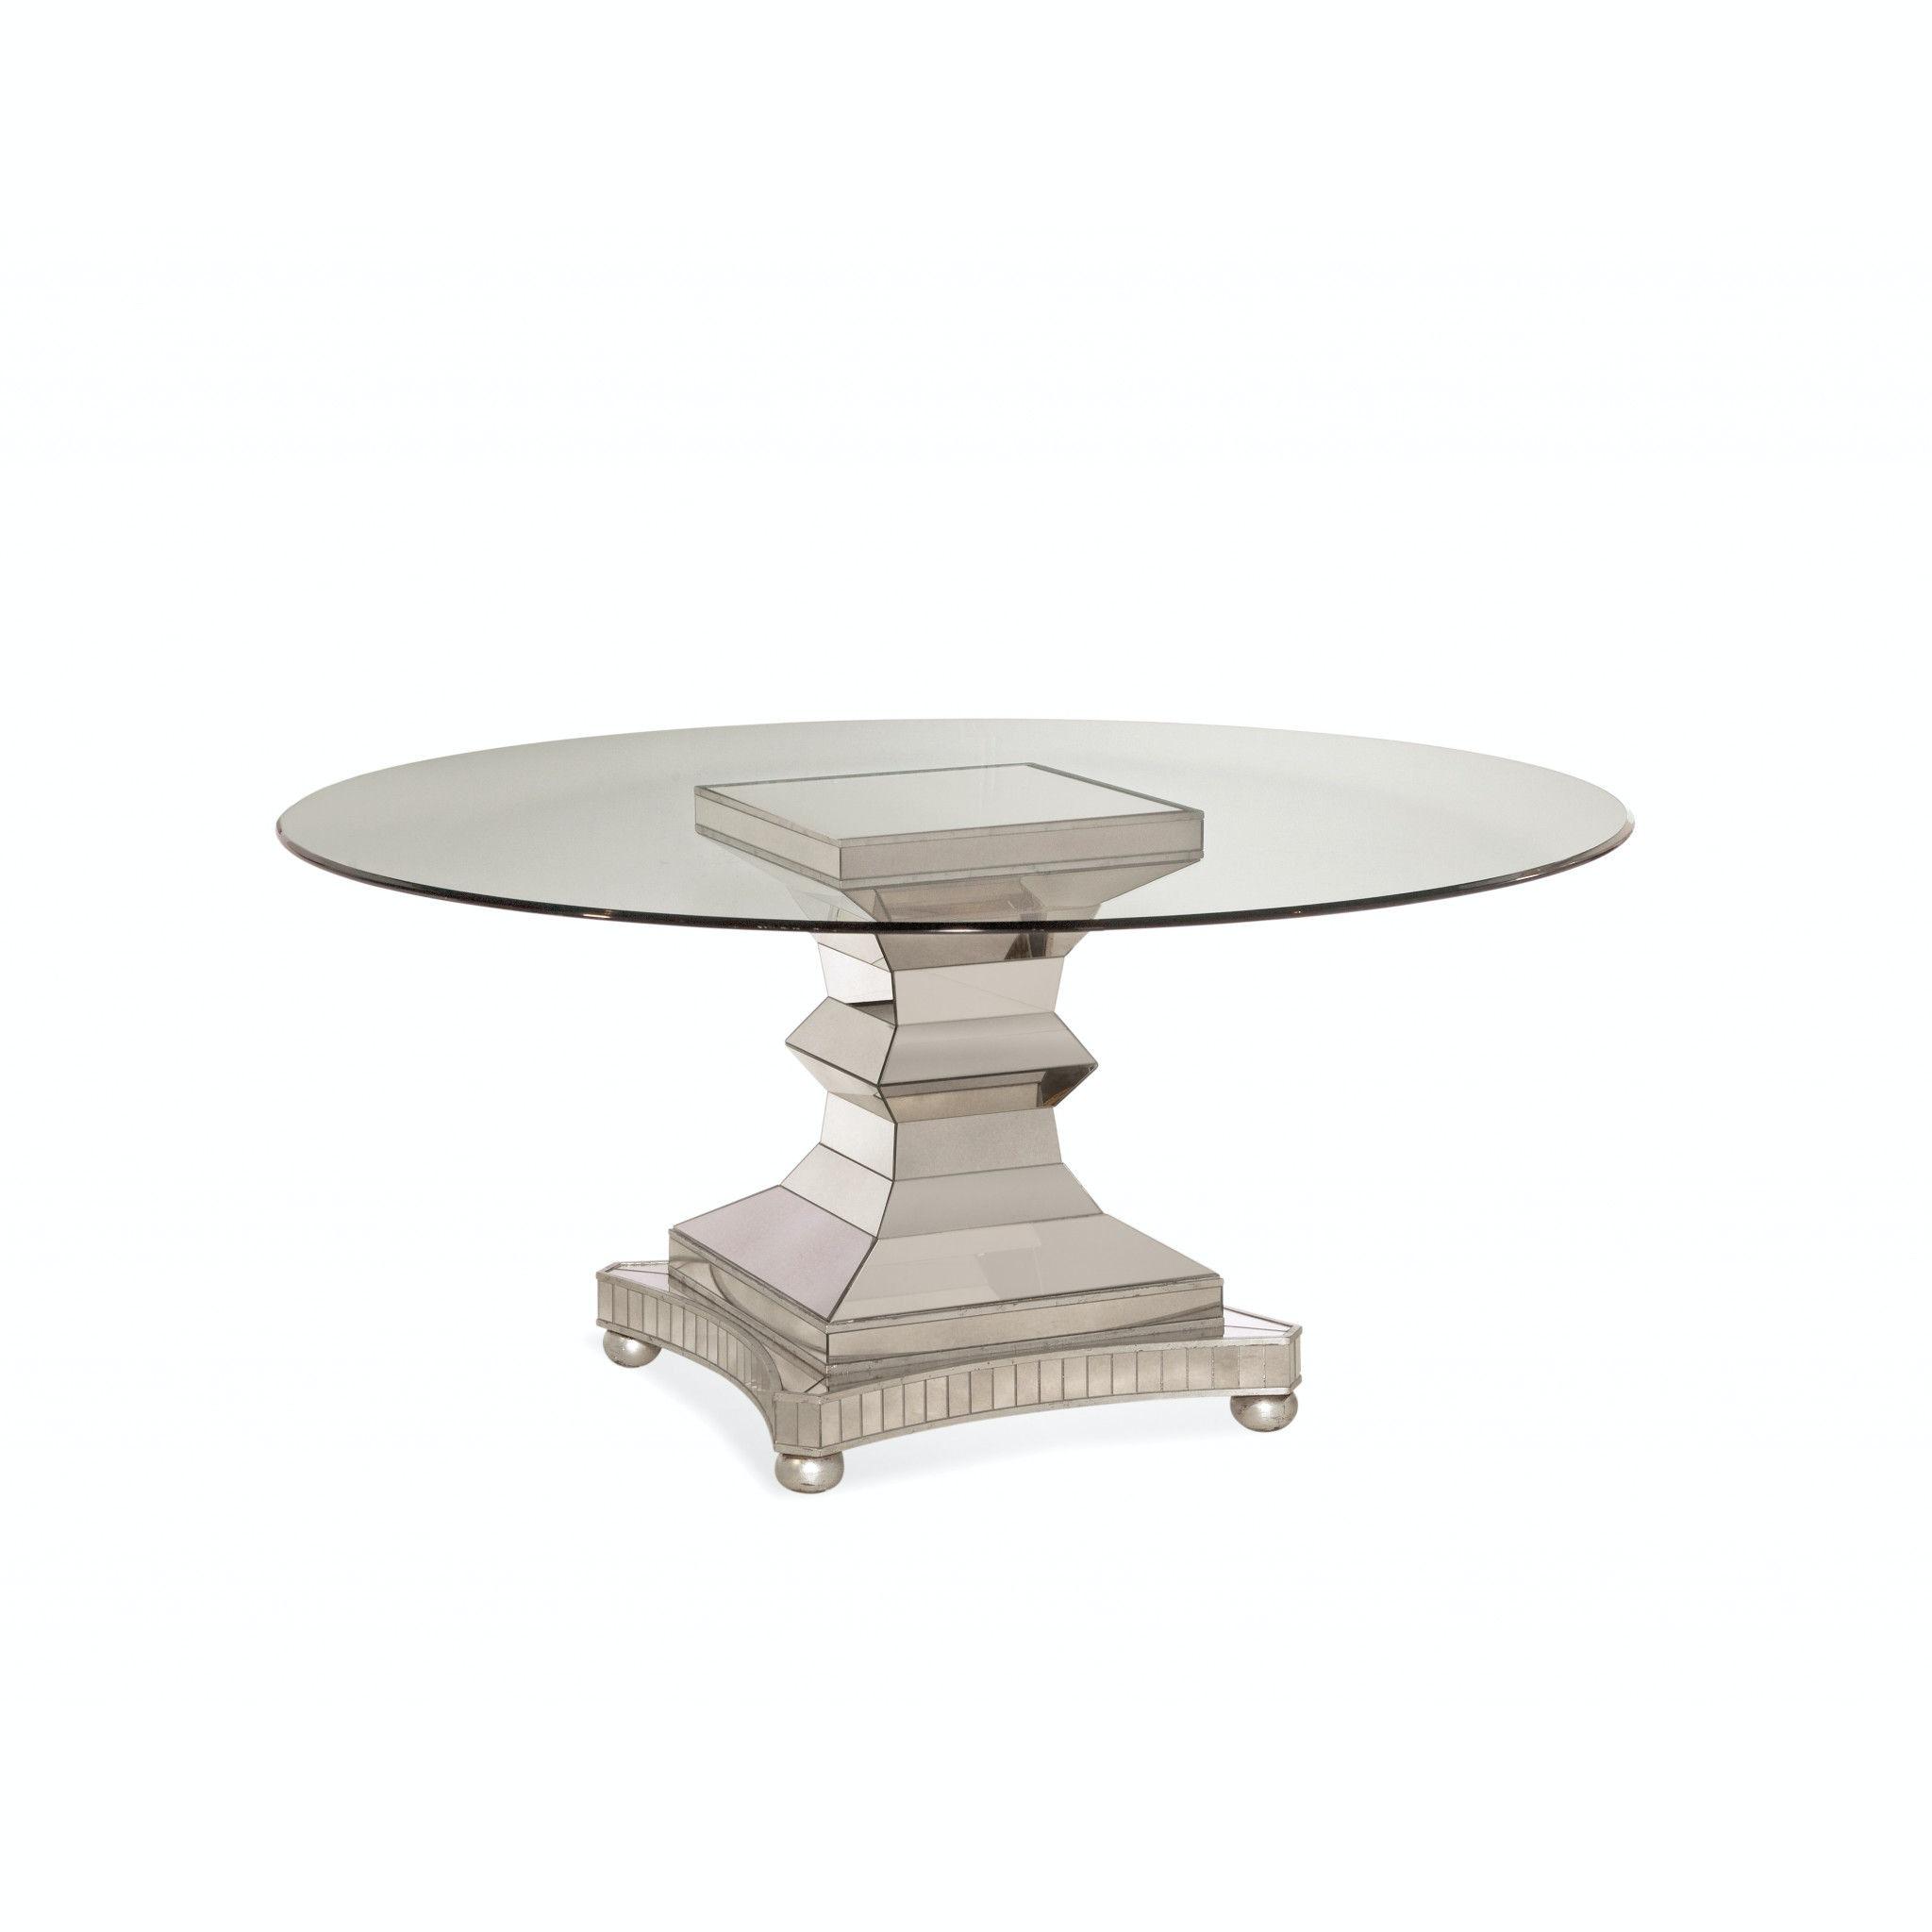 Bassett Mirror Company Moiselle Dining Table 3179-700-095 ...